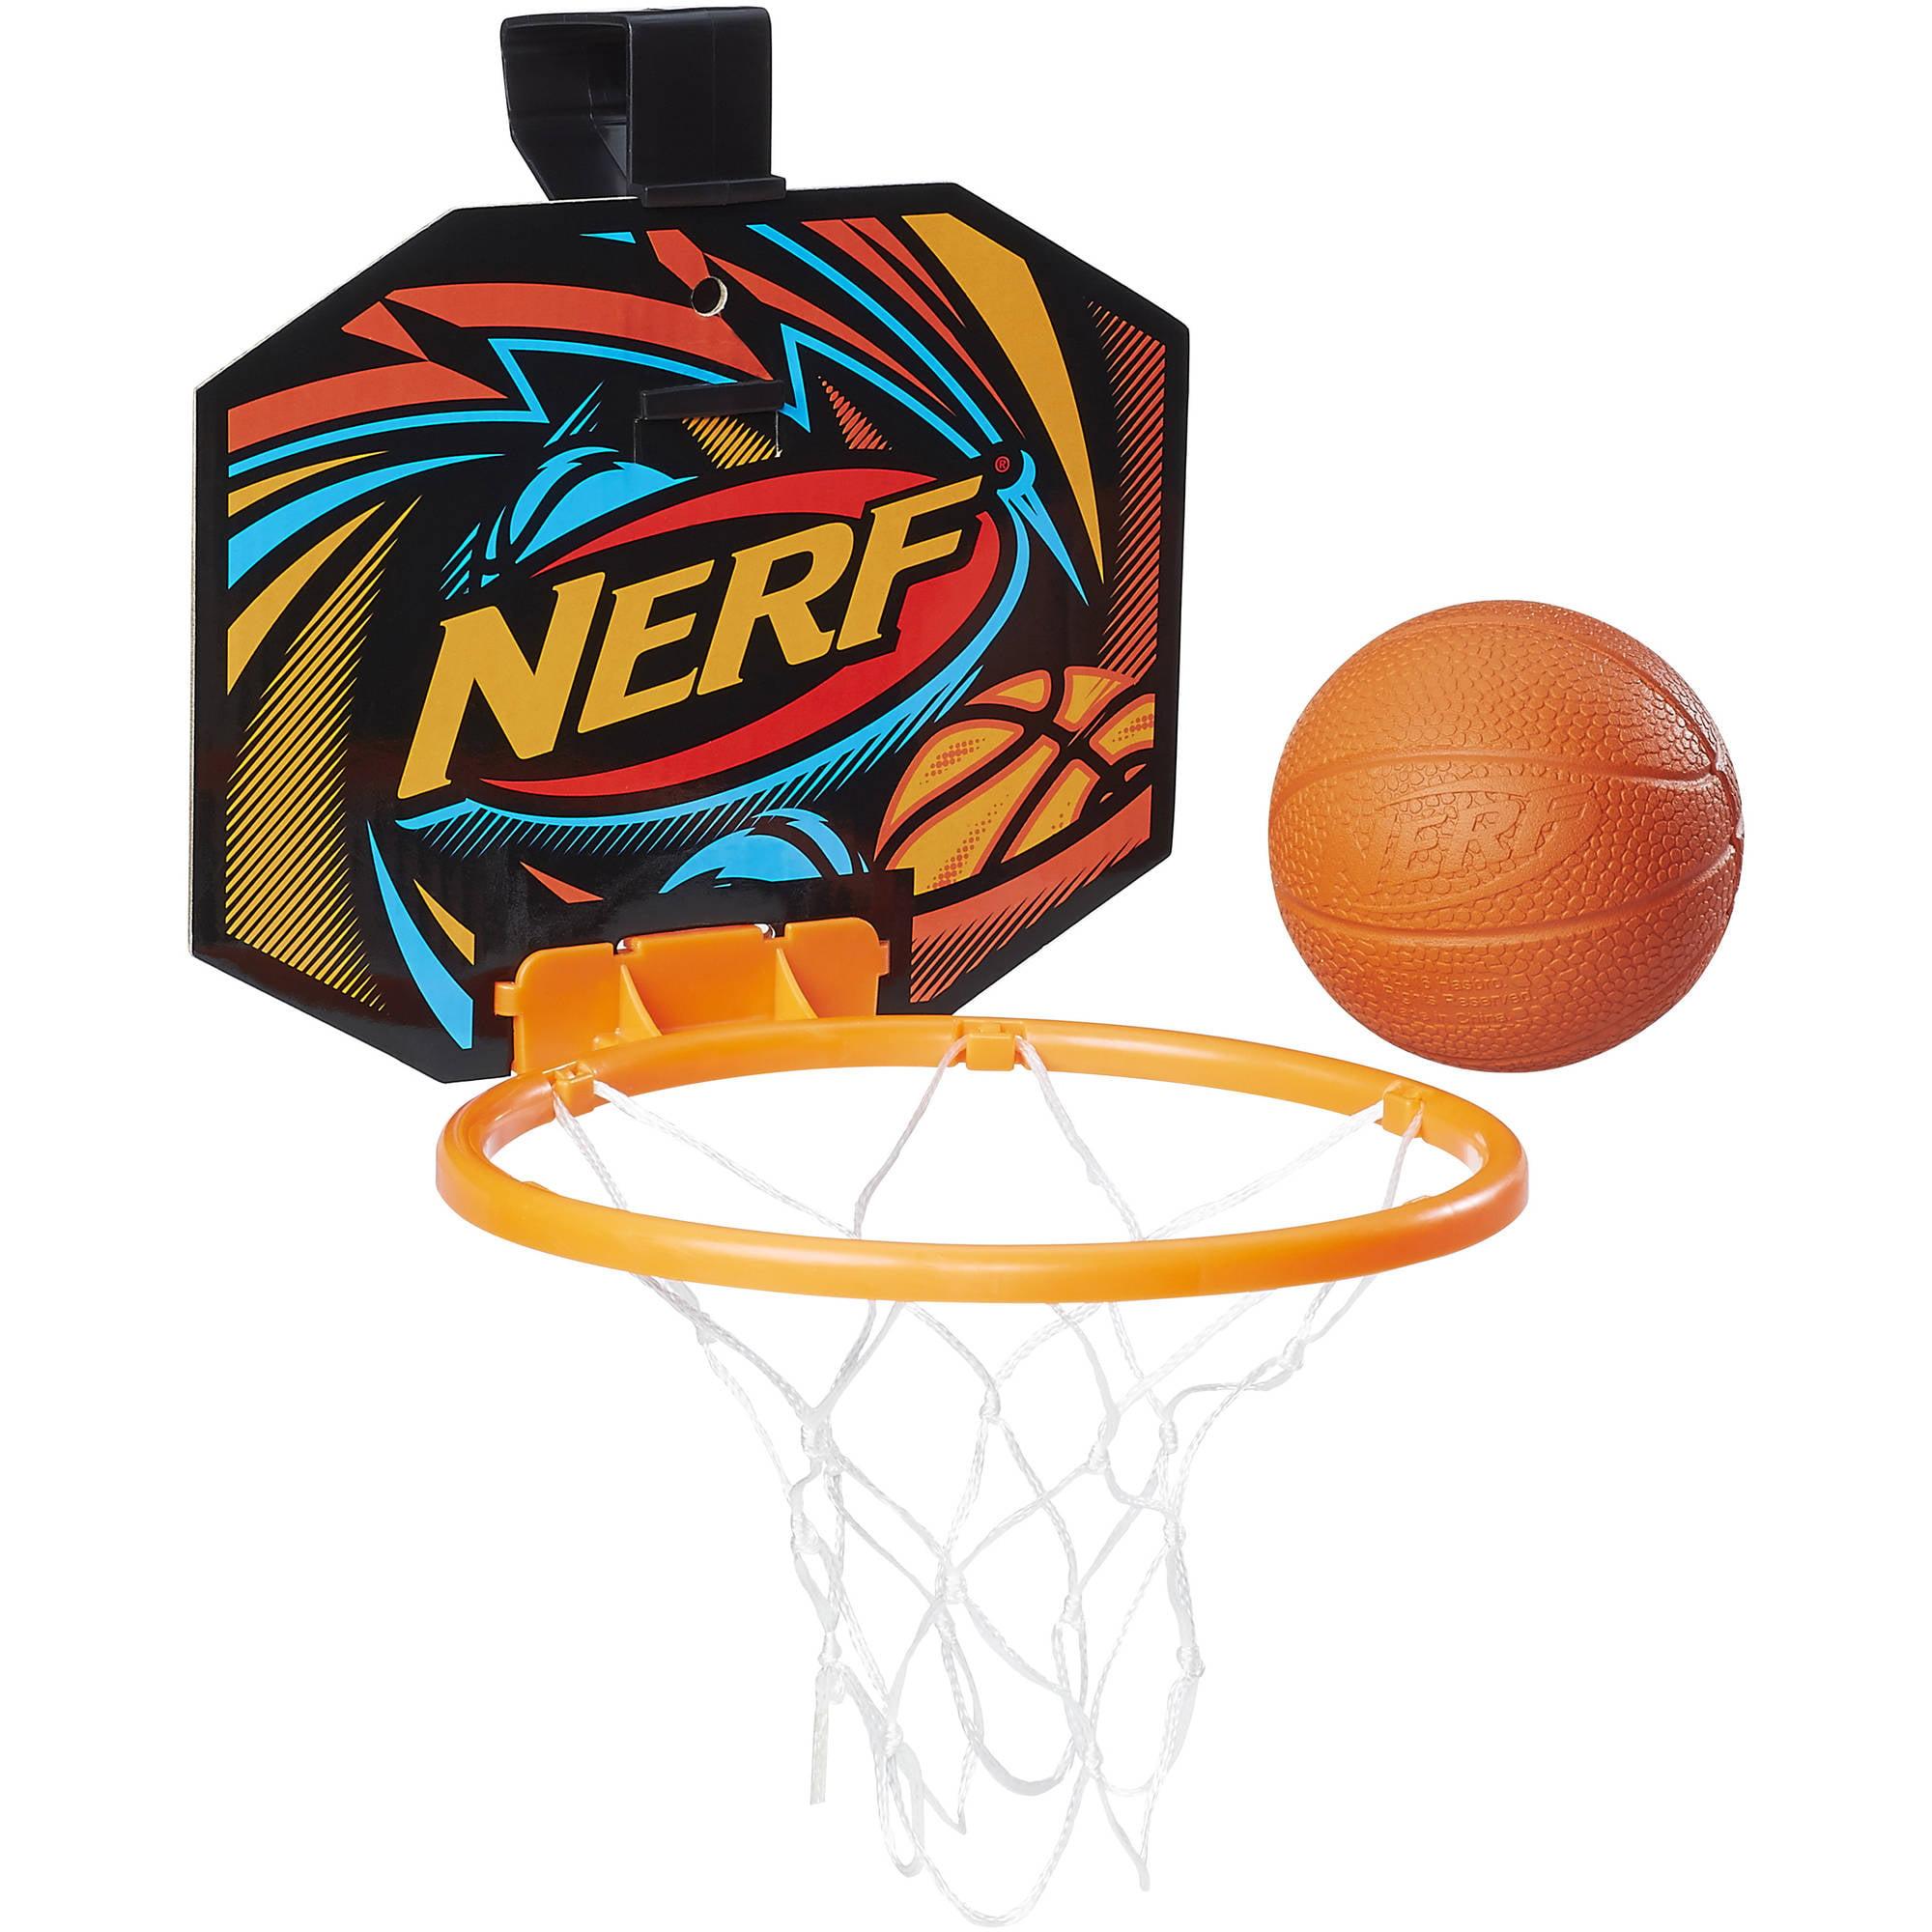 Nerf Sports Nerfoop Jump Shot by Hasbro